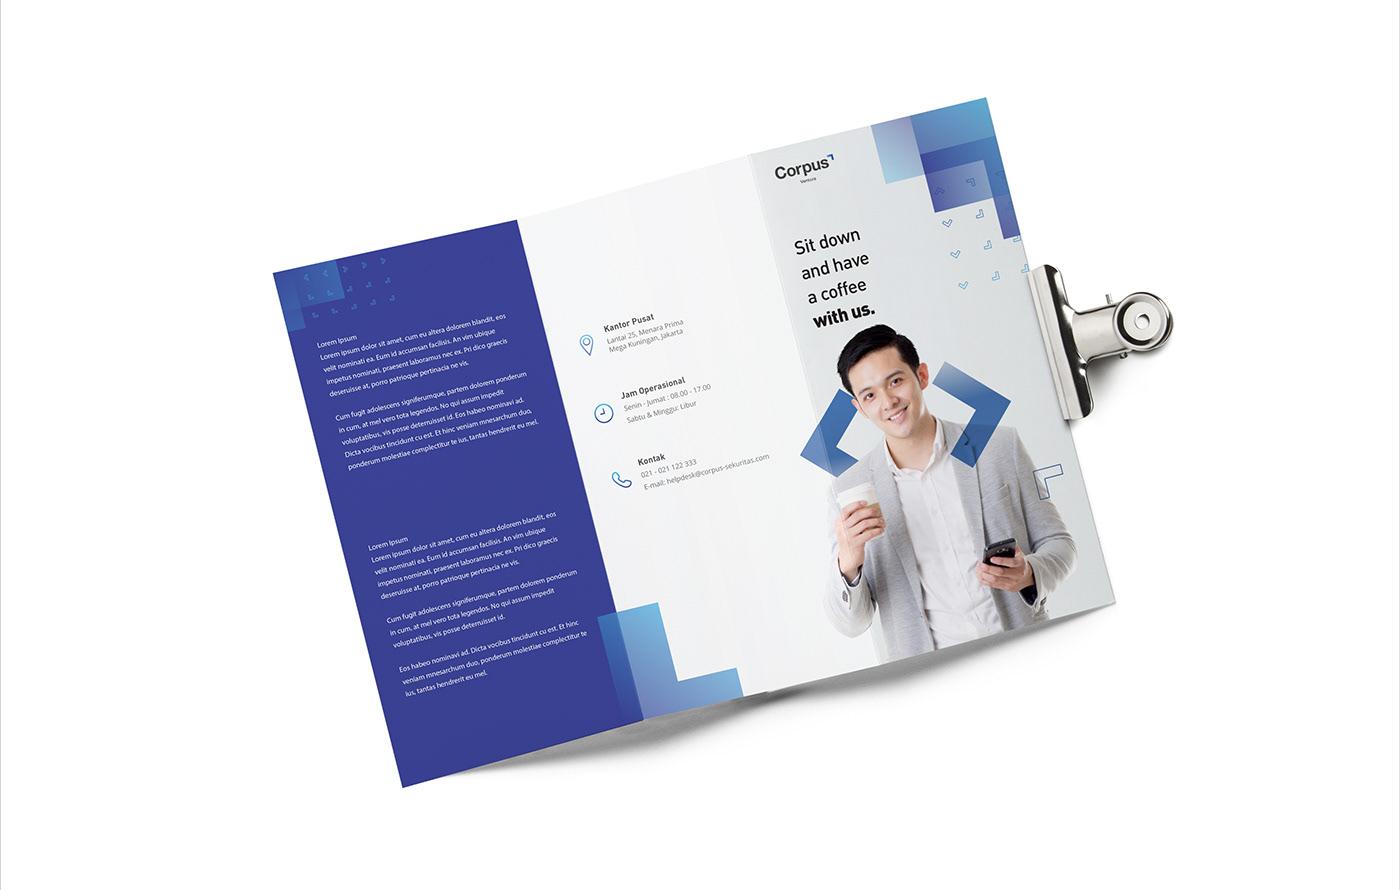 asset brand identity branding  editorial financial group logo Secure social media ventura visual identity